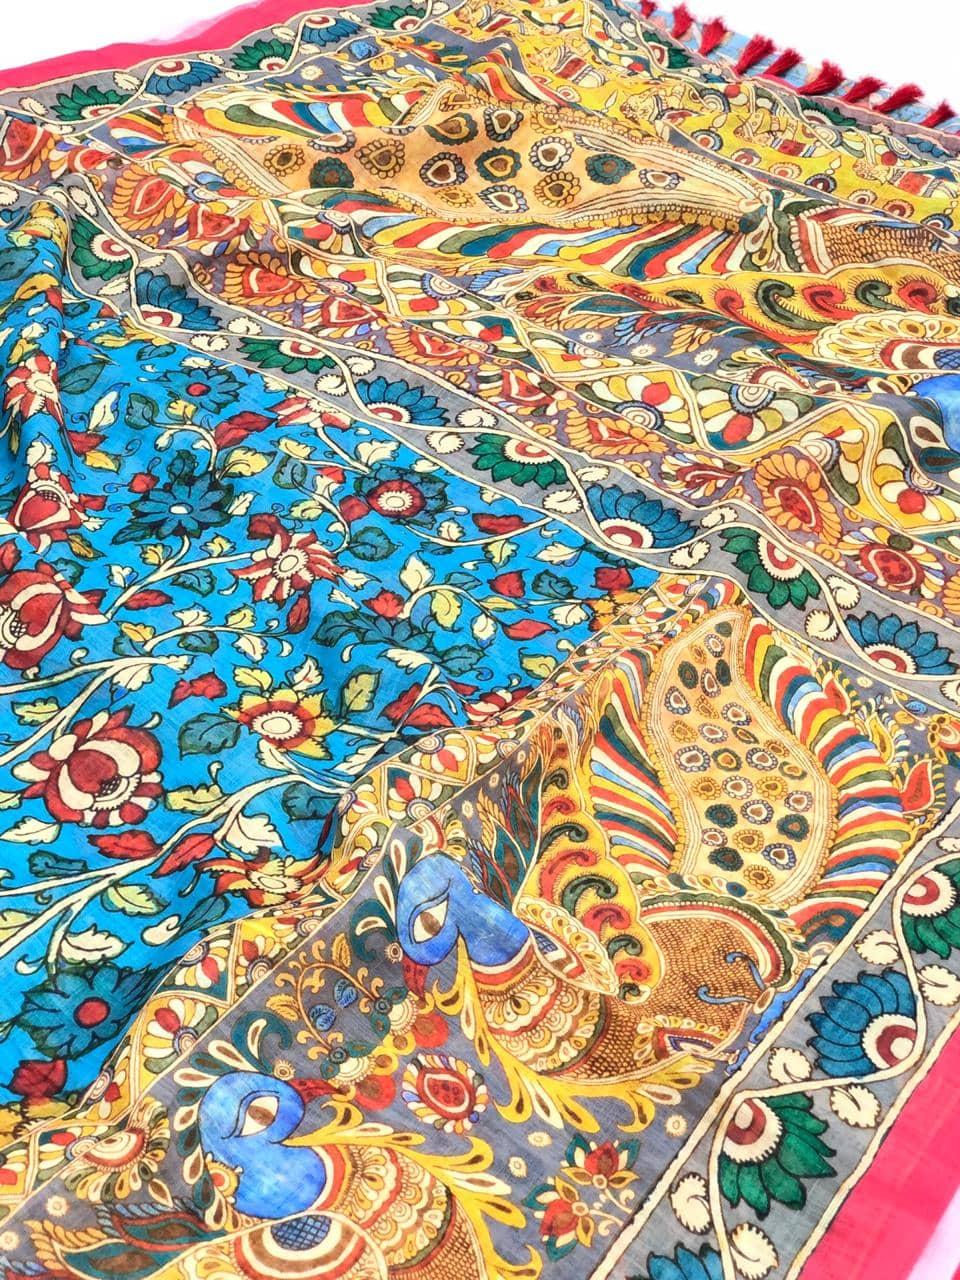 newest addition special Kalamkari Linen Saree in Bue dvz0001721